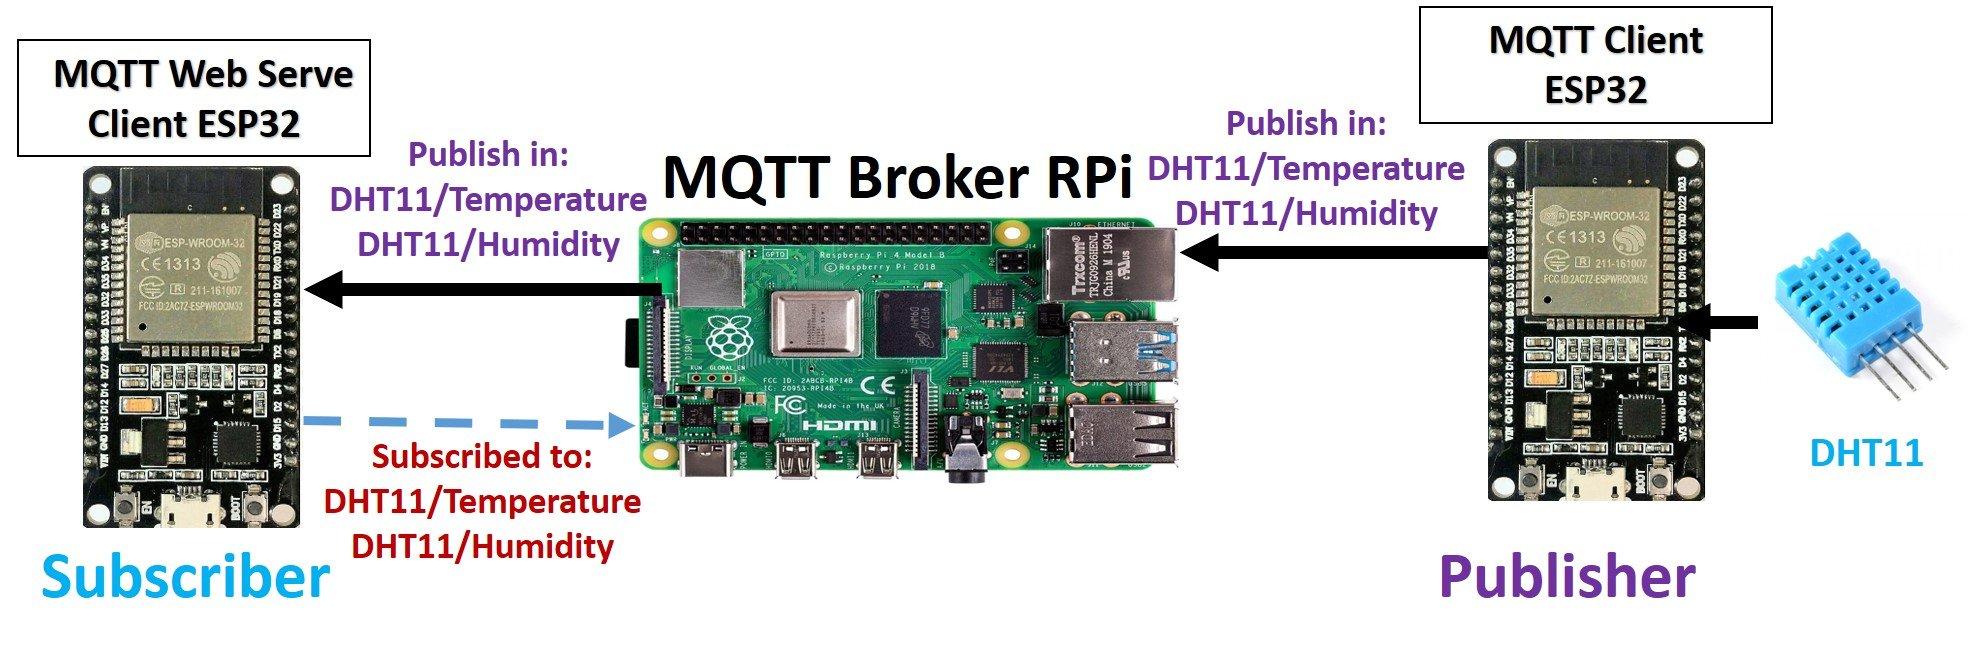 MQTT Publisher Subscriber ESP32 with raspberry pi broker 2